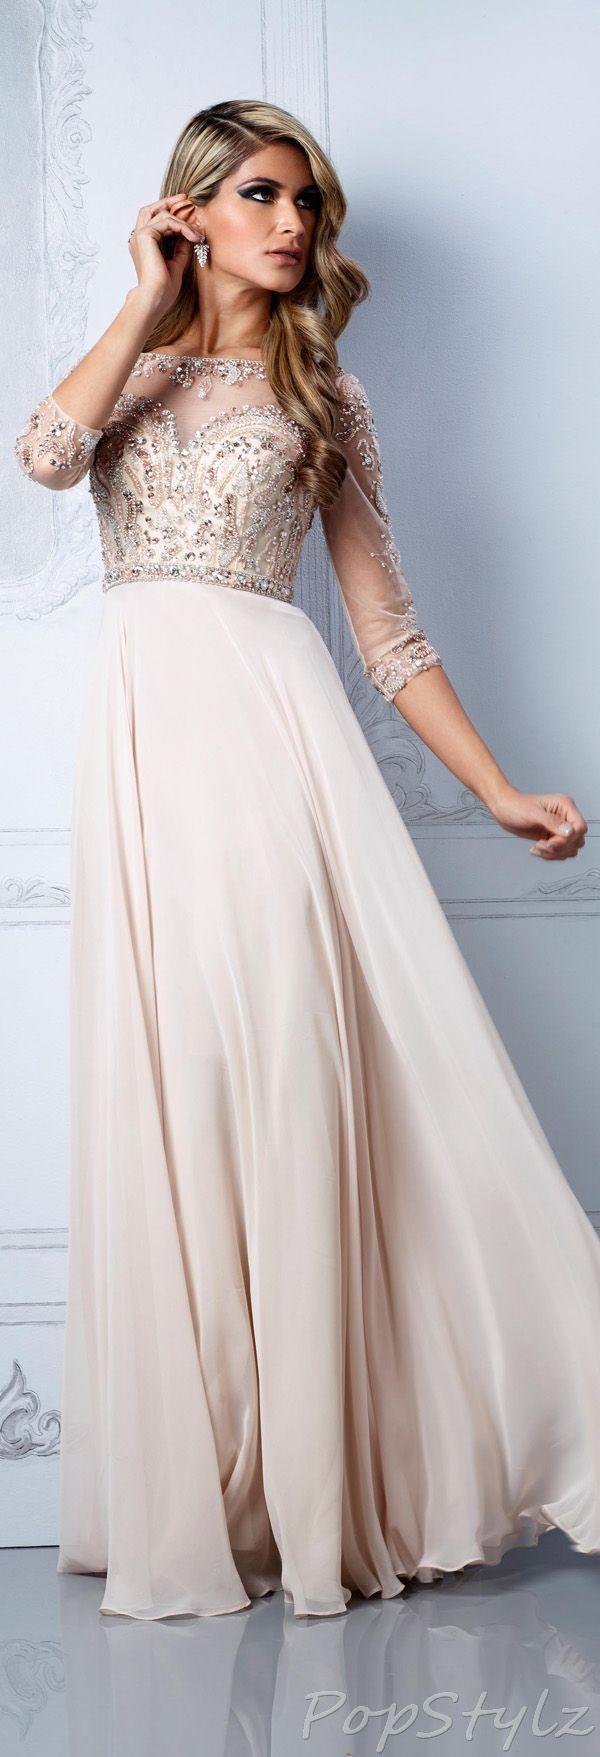 best robesdresses images on pinterest wedding dressses